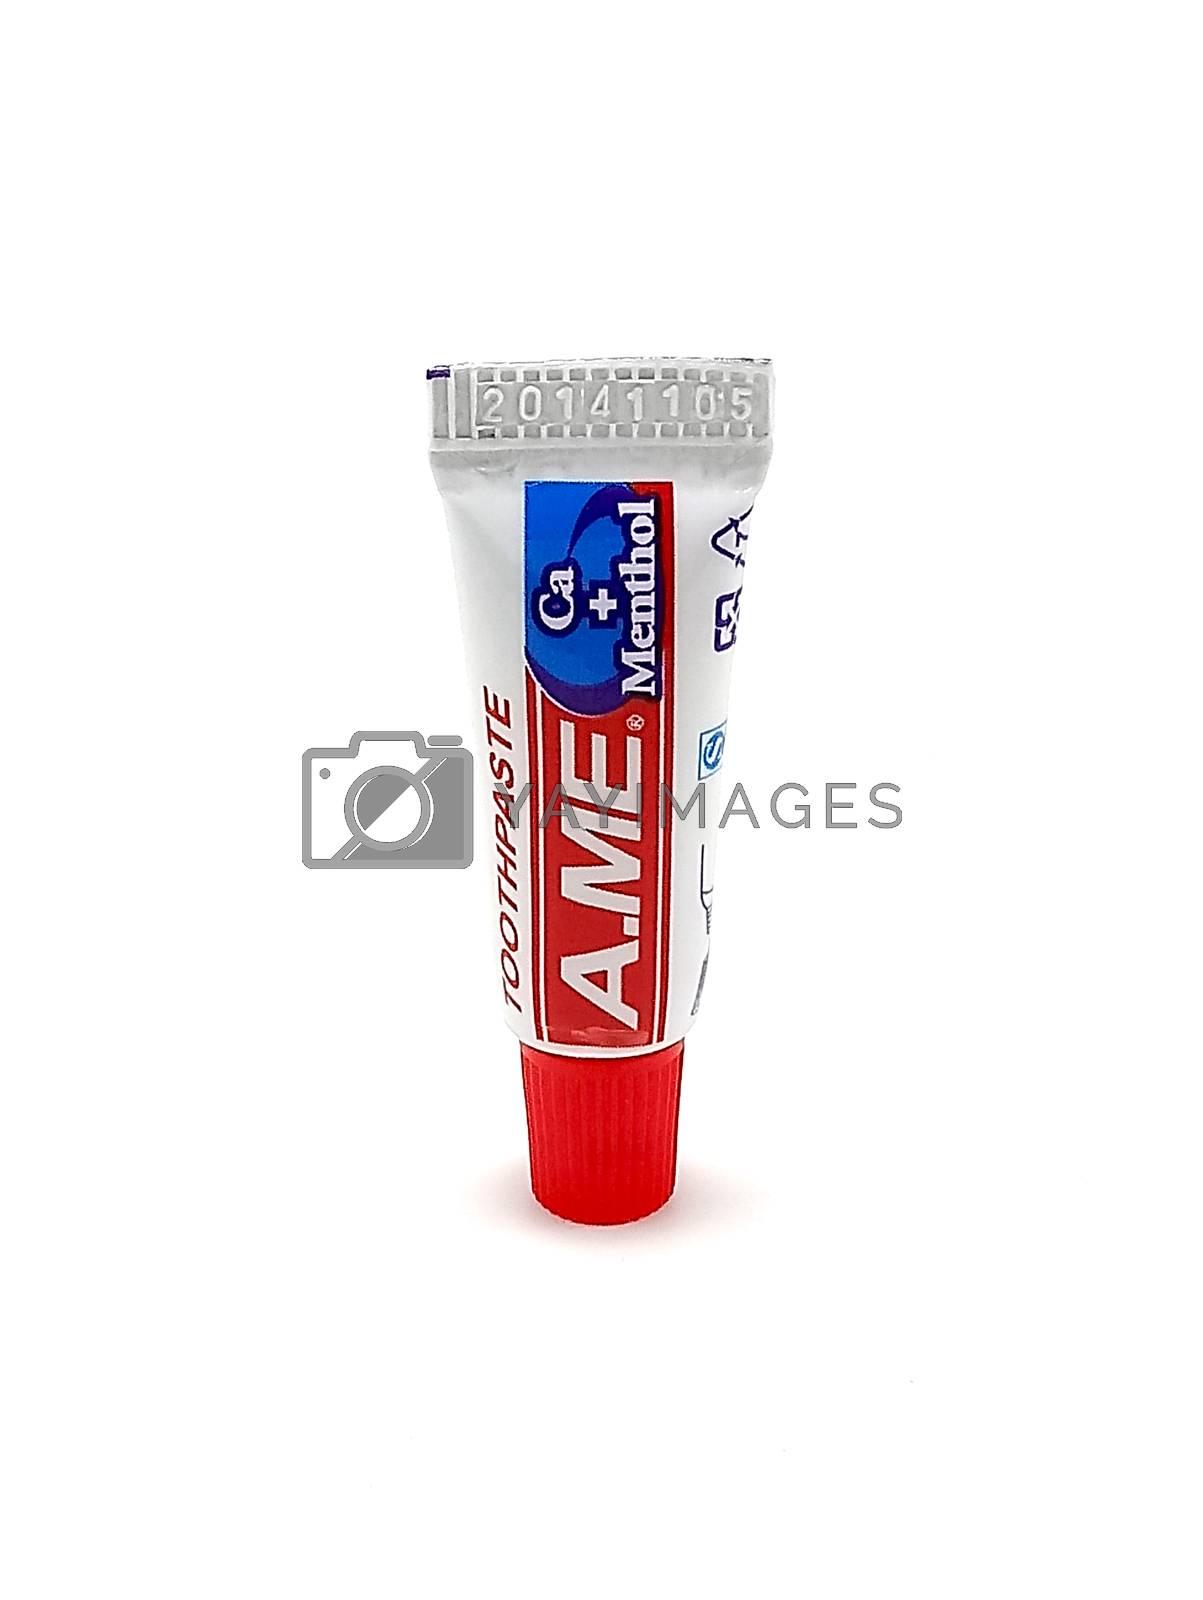 MANILA, PH - JUNE 23 - Ame toothpaste tube on June 23, 2020 in Manila, Philippines.